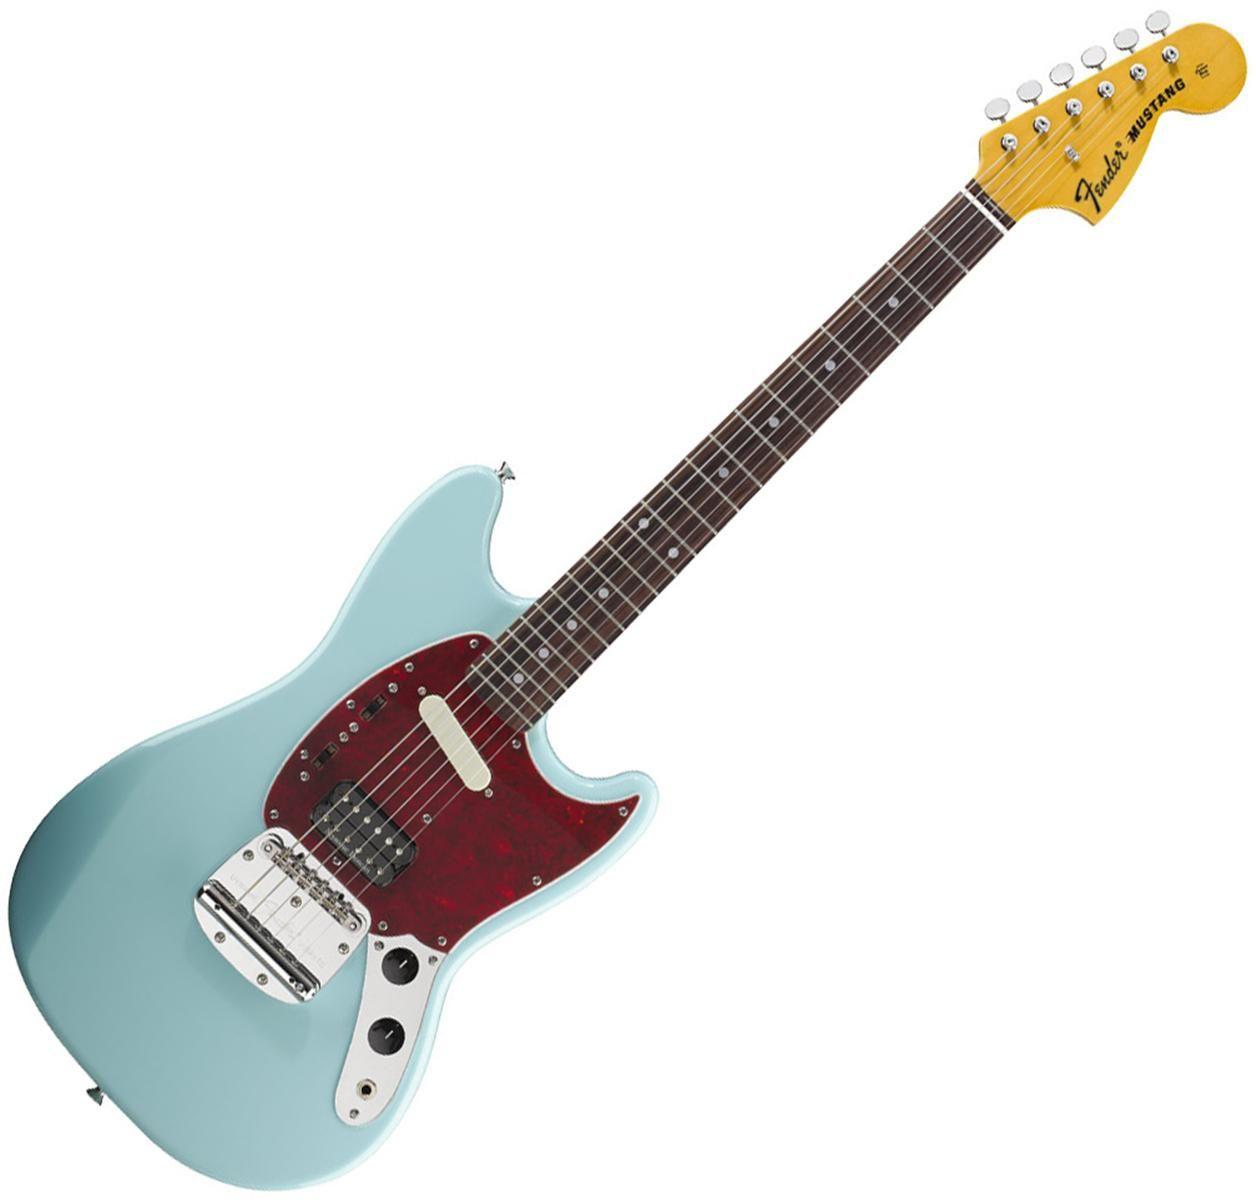 Kurt Cobains Fender Mustang in Sonic Blue <3 | Amazing Guitars ...